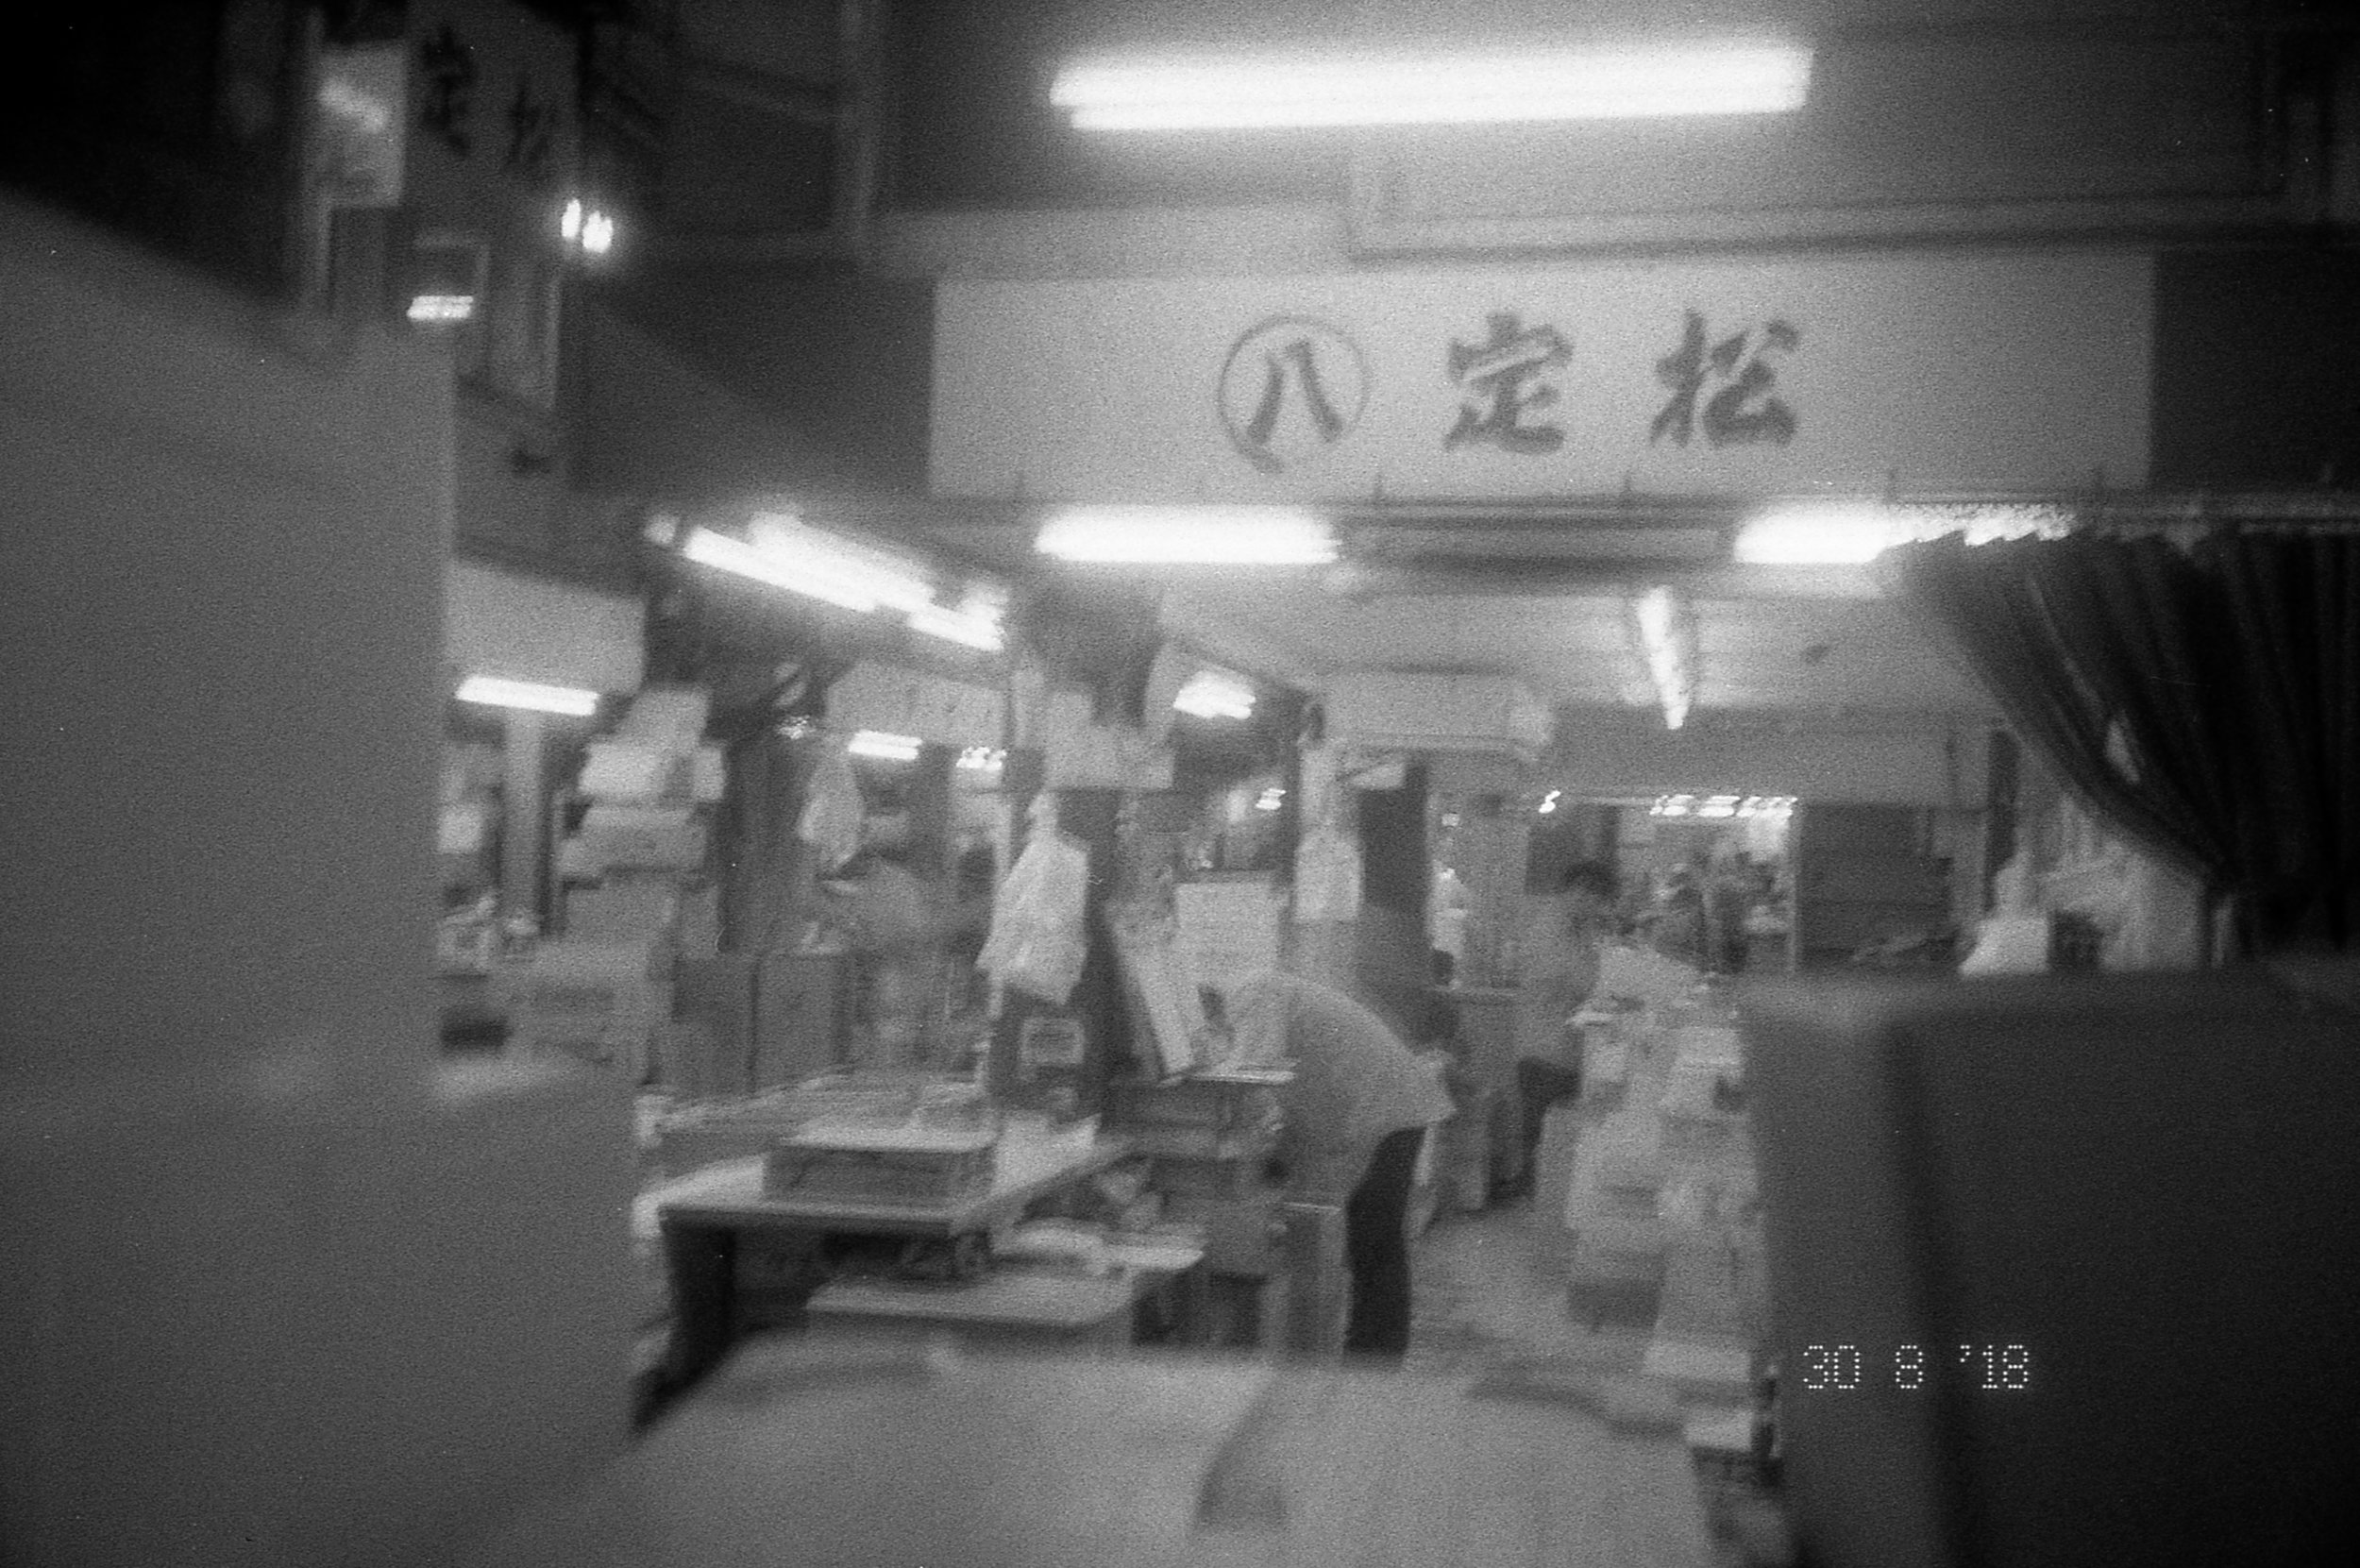 20180829_30_Hiro_Tkyo_021.jpg